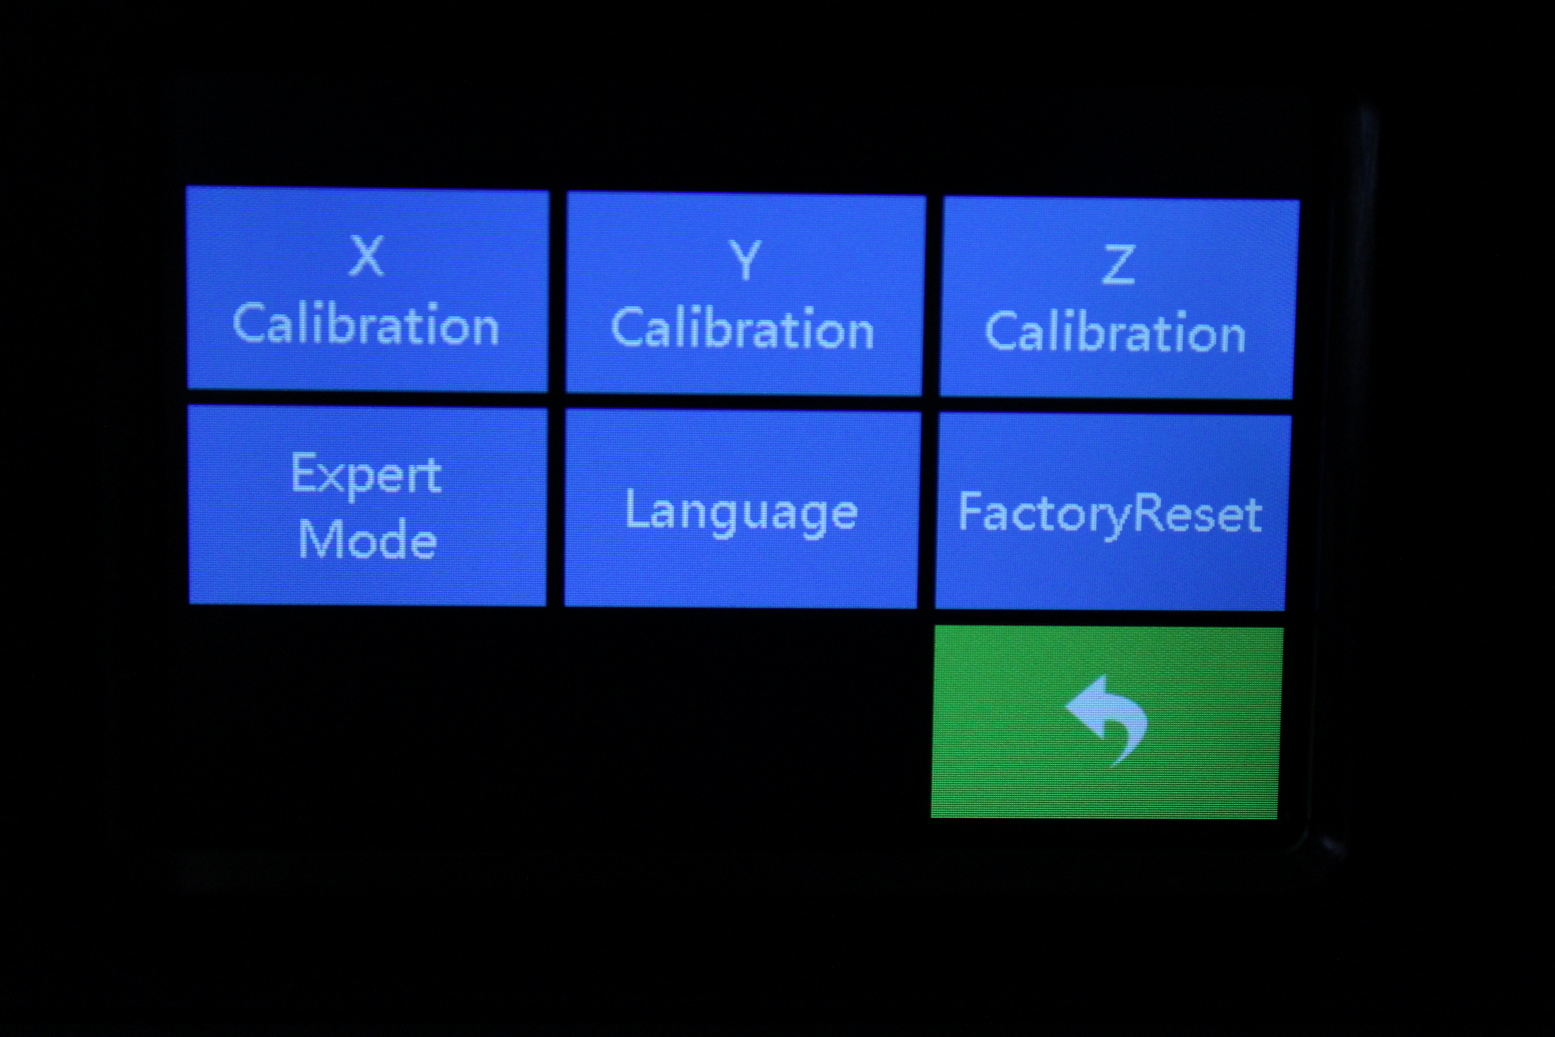 FlashForge-Creator-Pro-2-Touchscreen-Interface-13